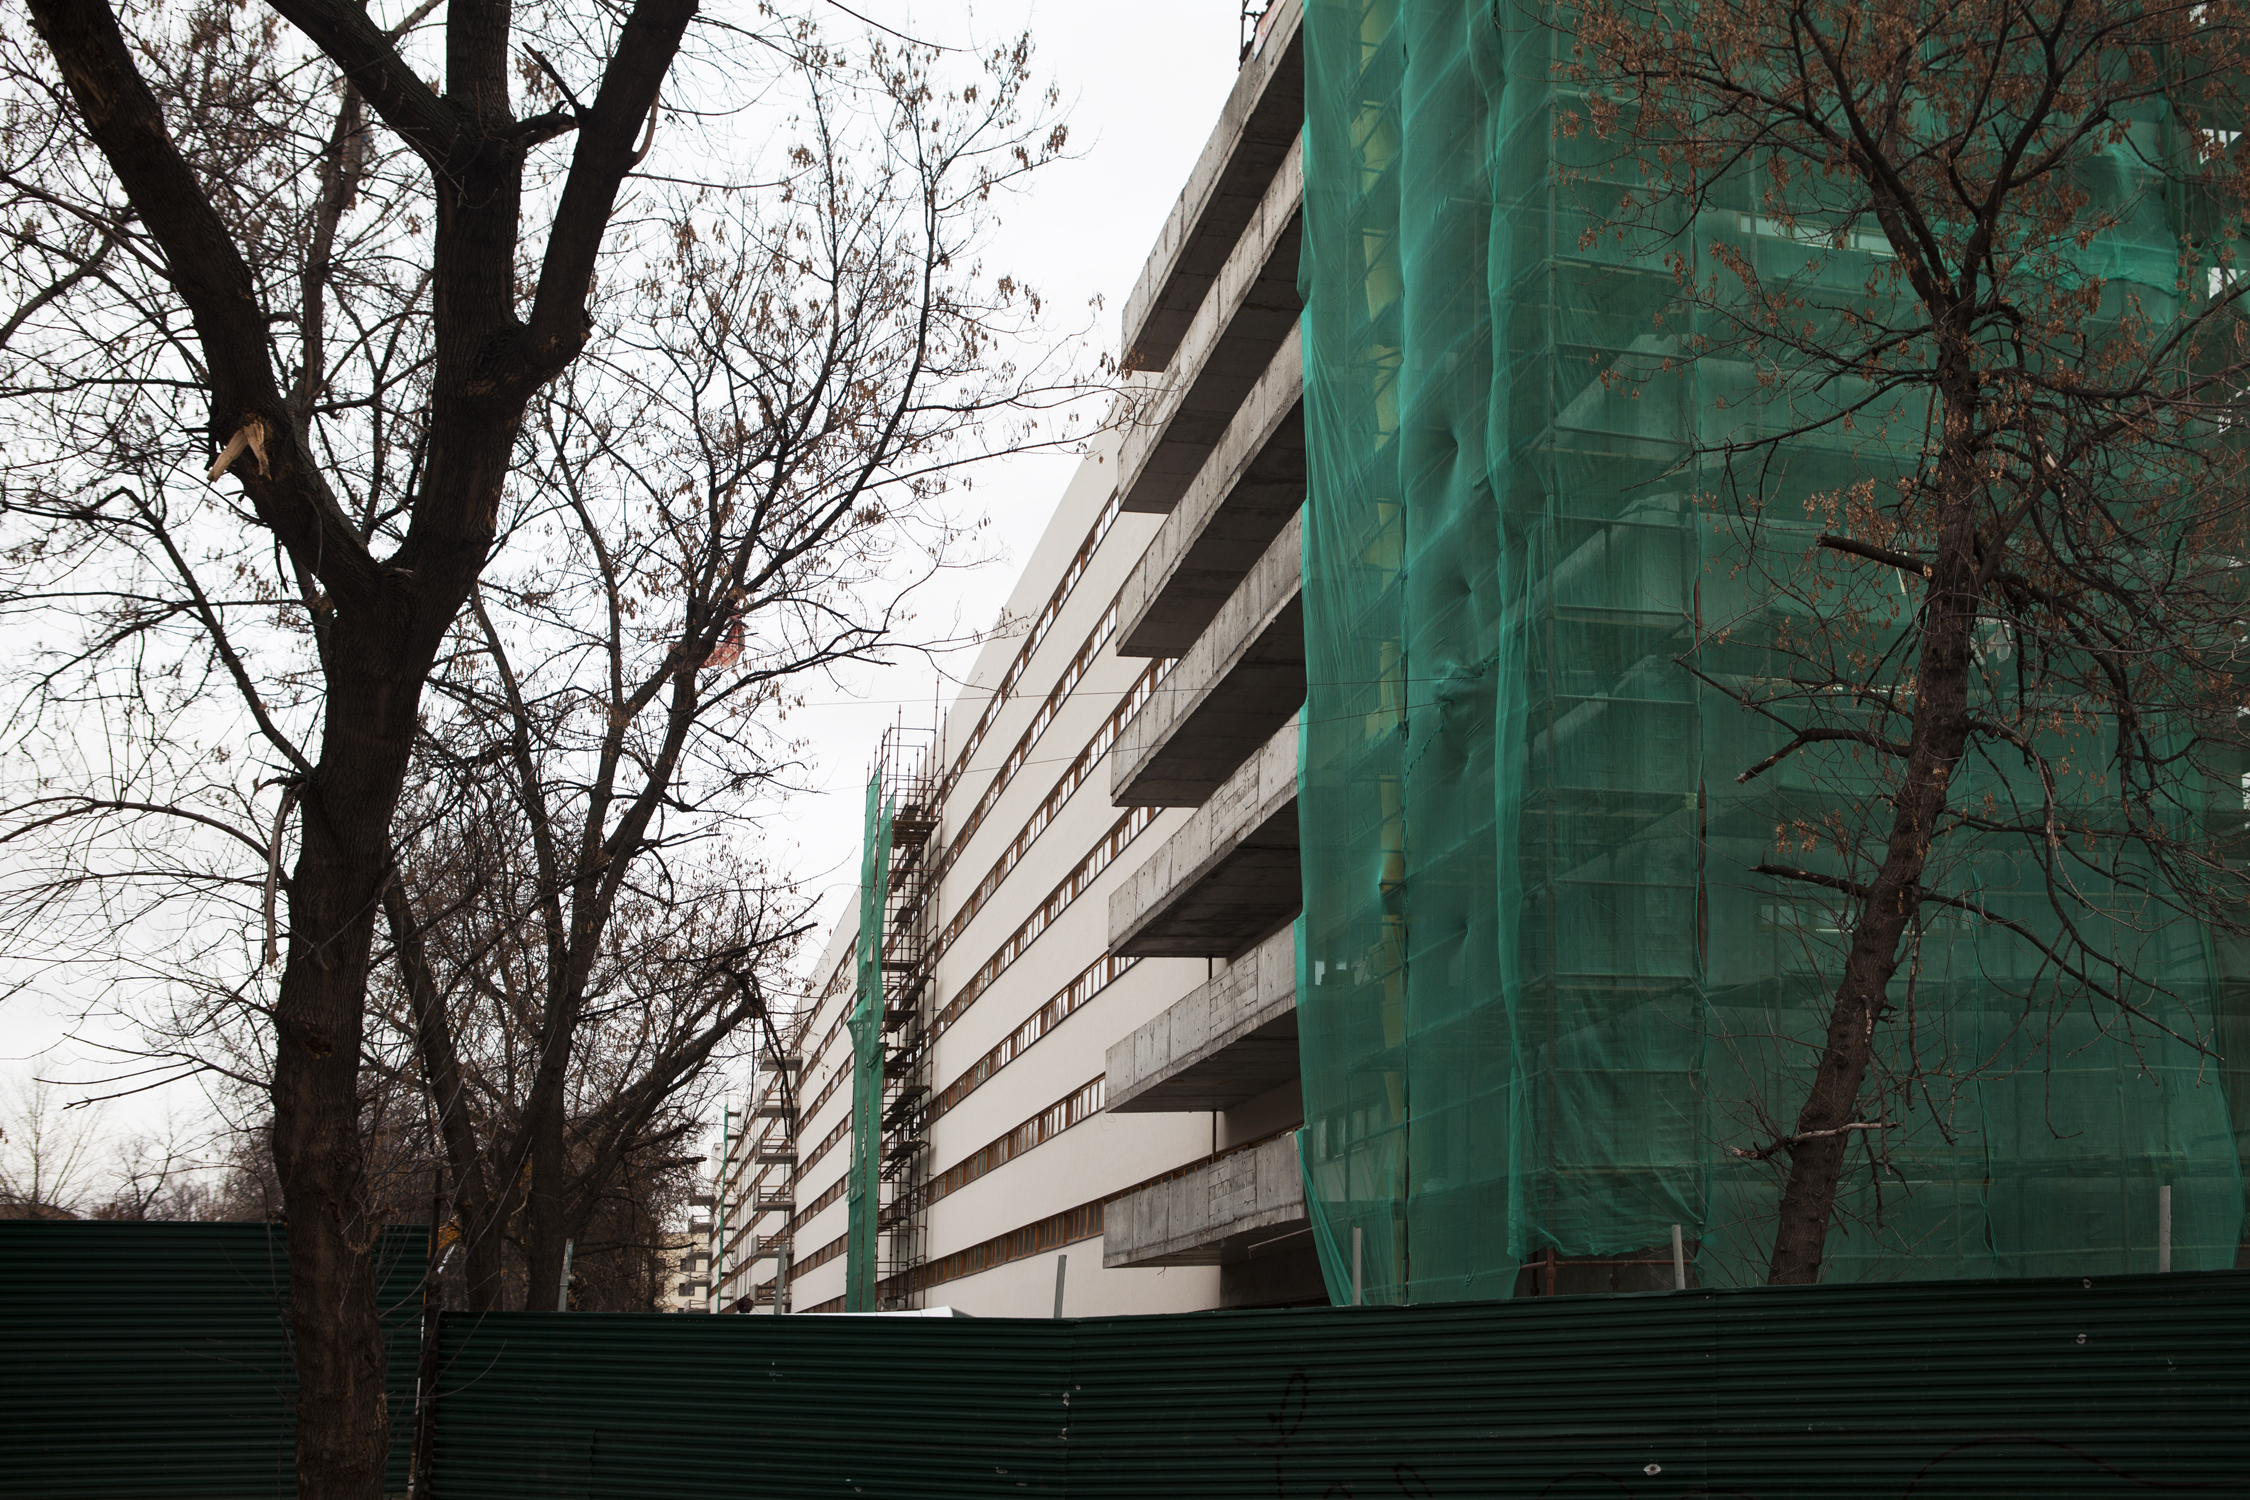 Nikolaev's Textile Industry Hostel